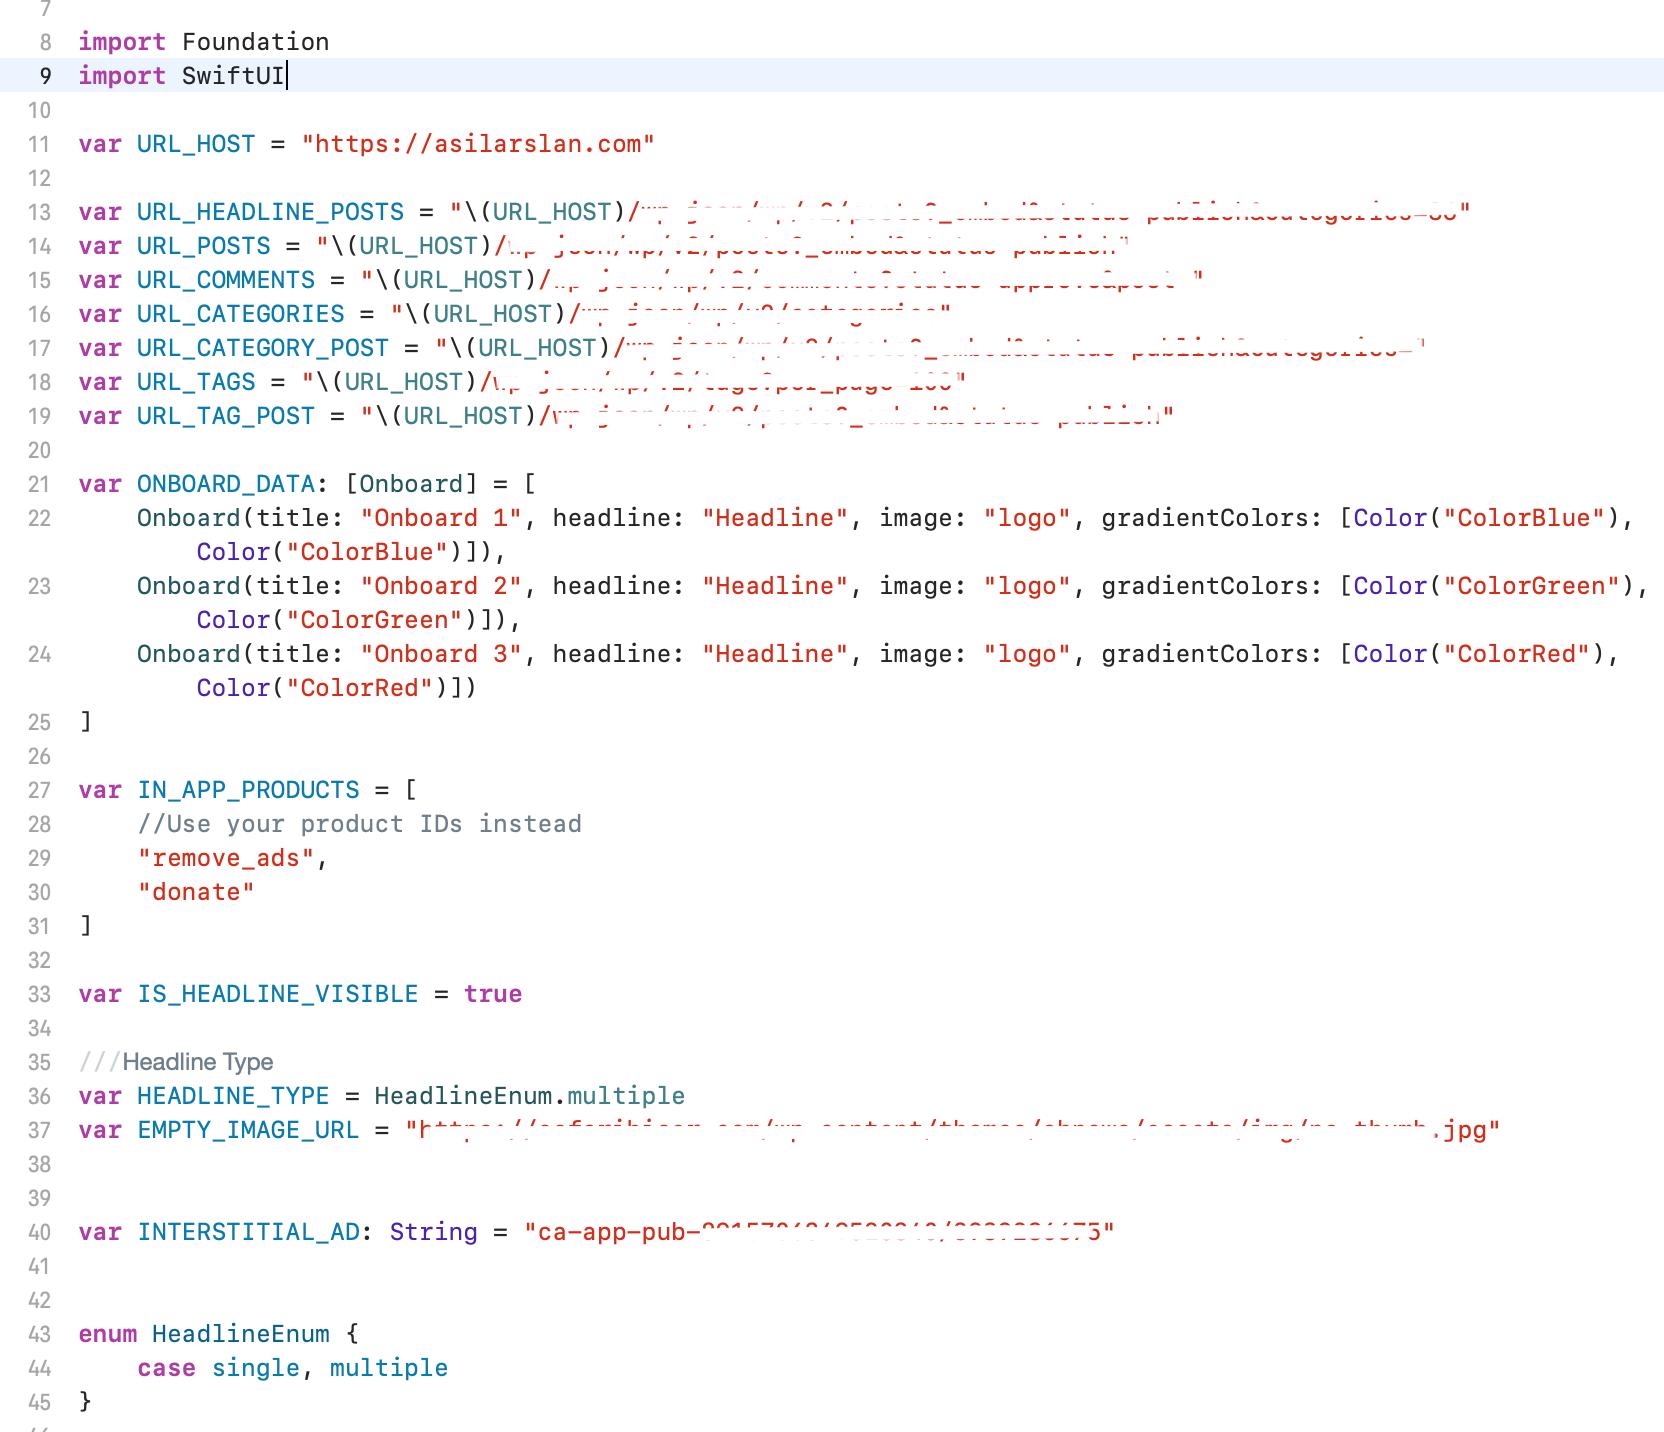 News SwiftUI WordPress Rest App | Full SwiftUI iOS Application - 1